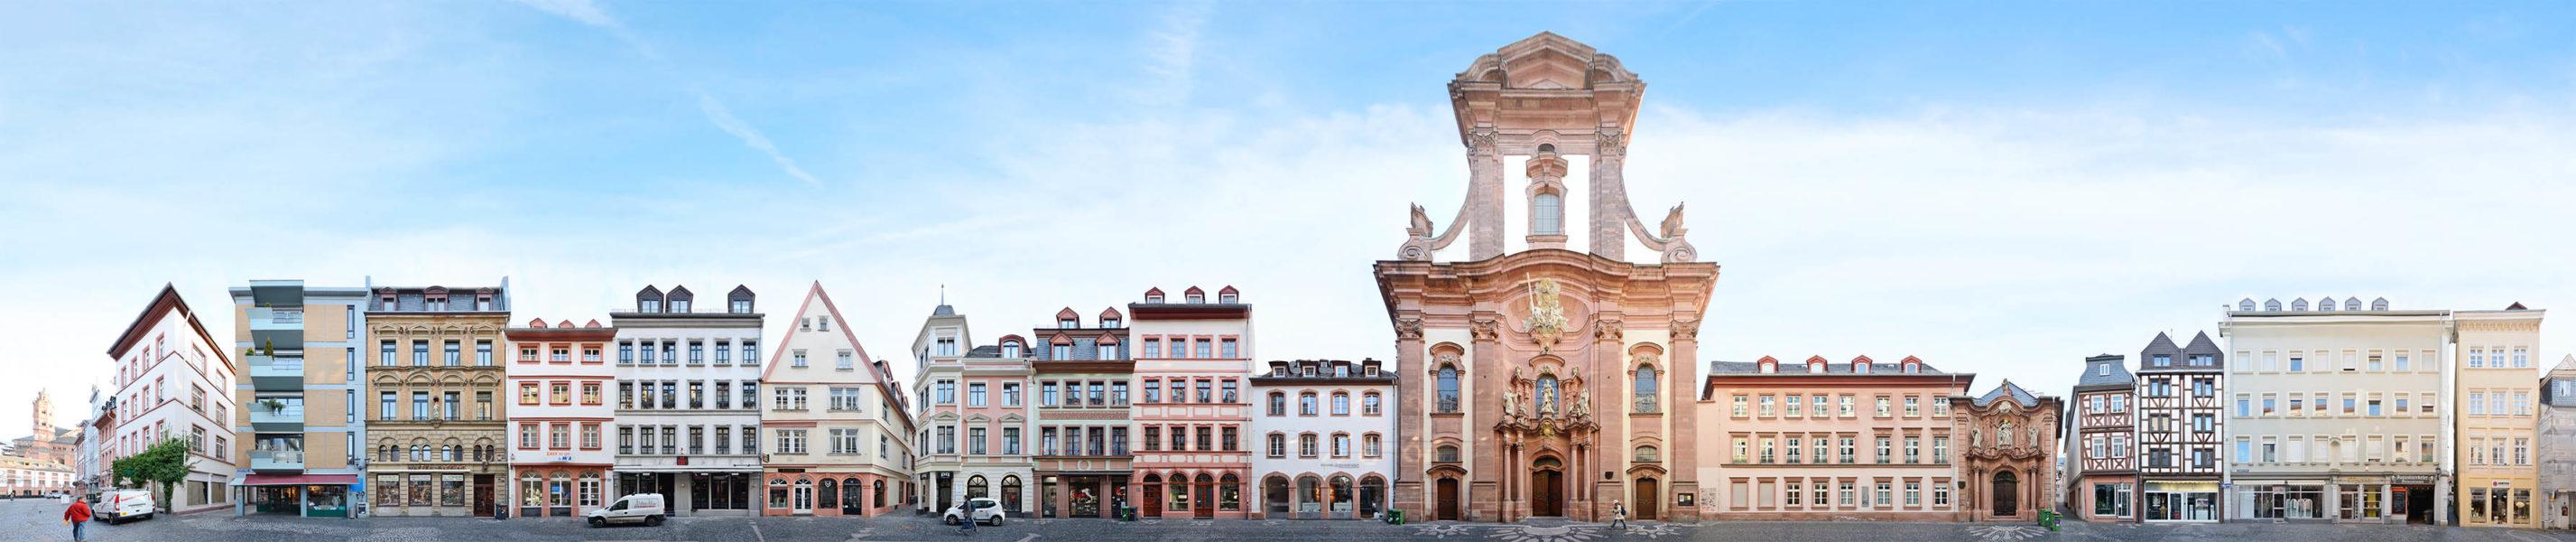 Church of St. Augustin | Augustinerstrasse